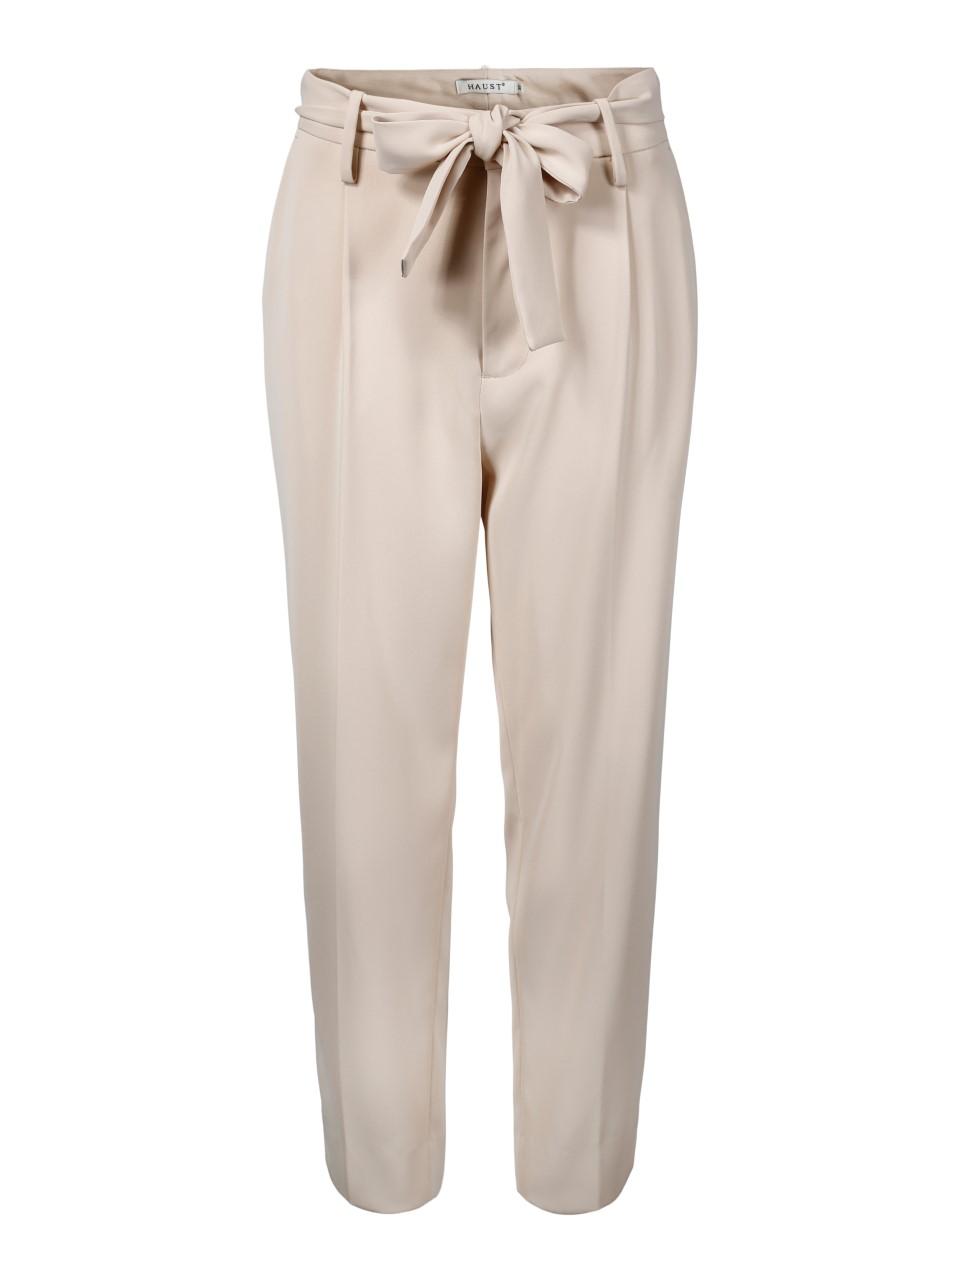 HAUST Tailored belt trouser